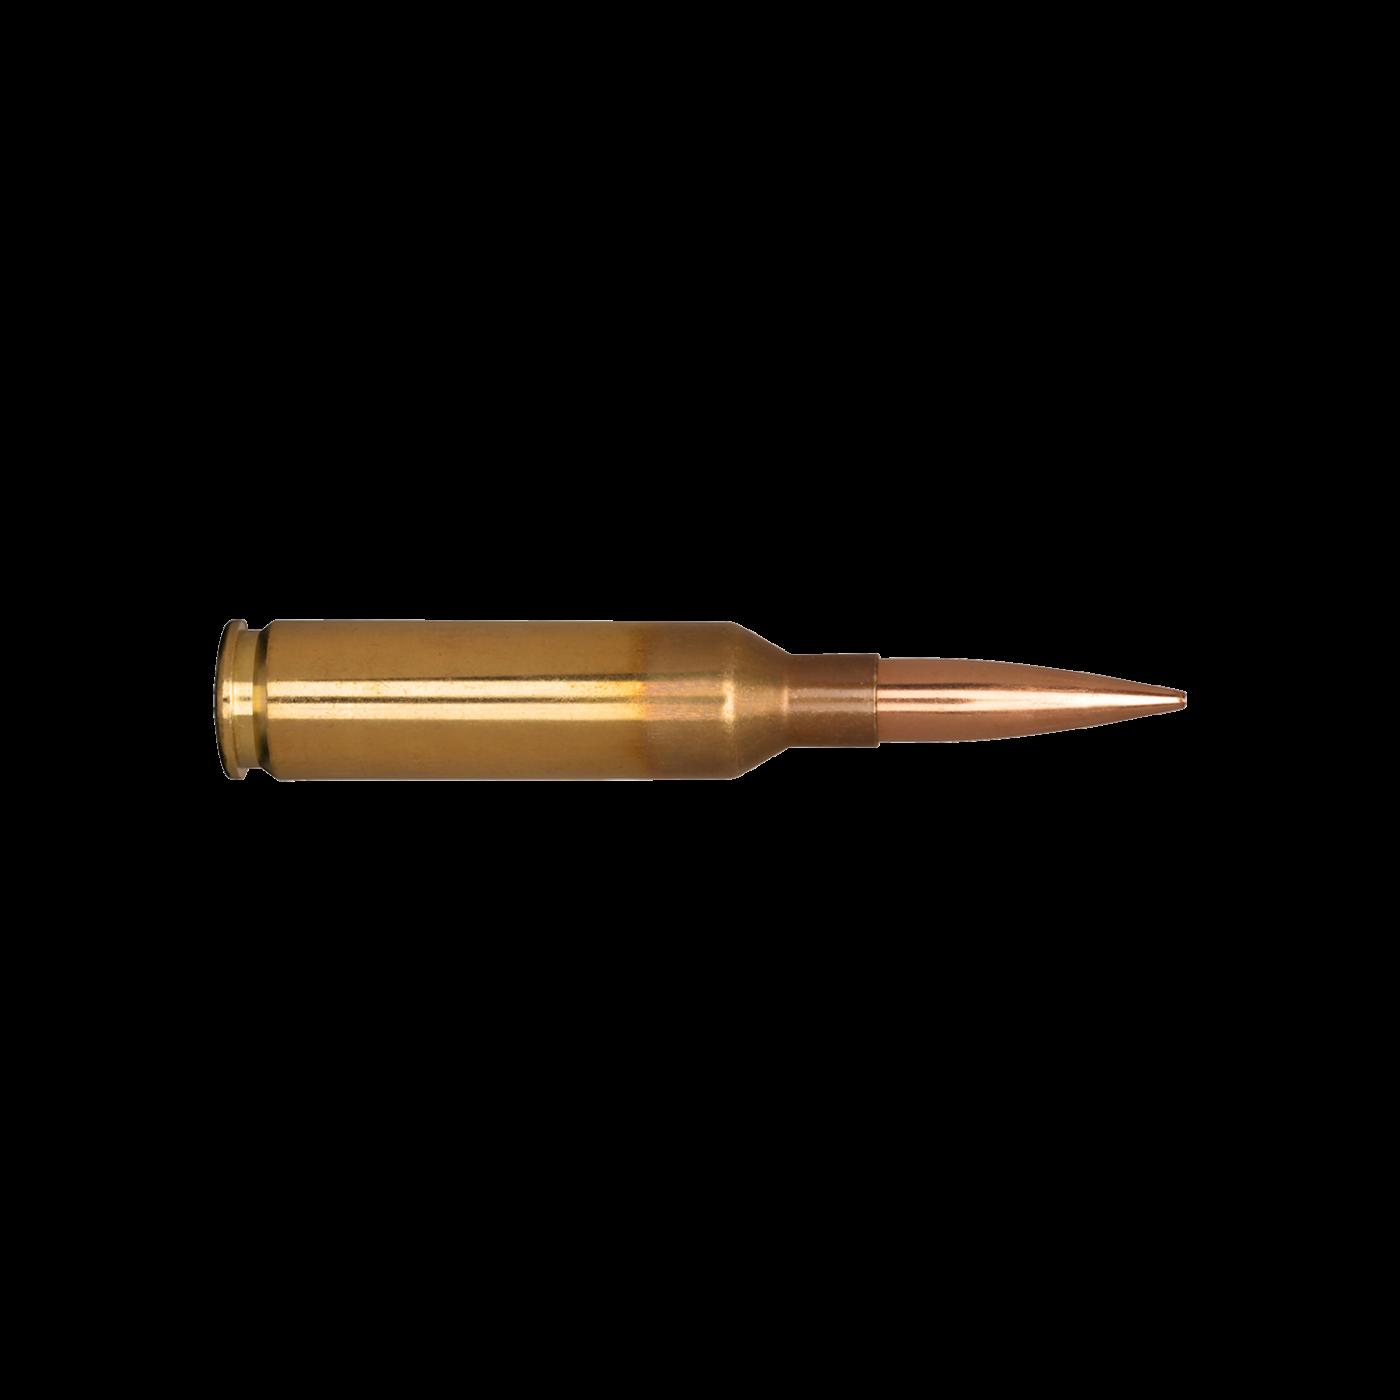 image of 6 mm Creedmoor 105gr Hybrid Target by Berger Bullets